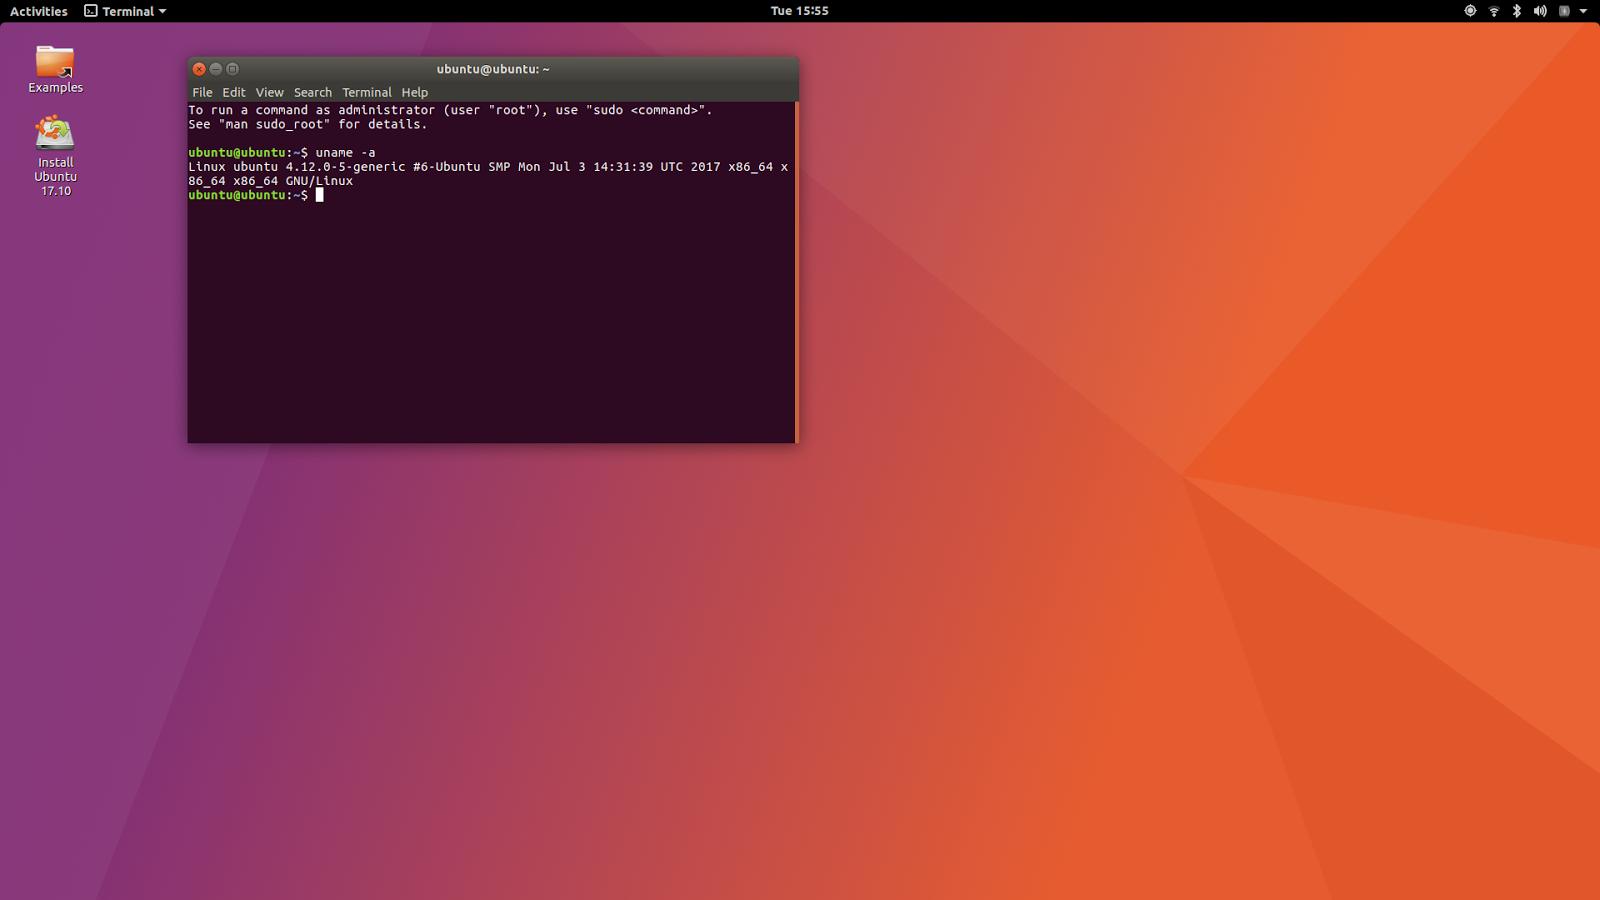 linuxium com au: Fifth look at Ubuntu 17 10: using an